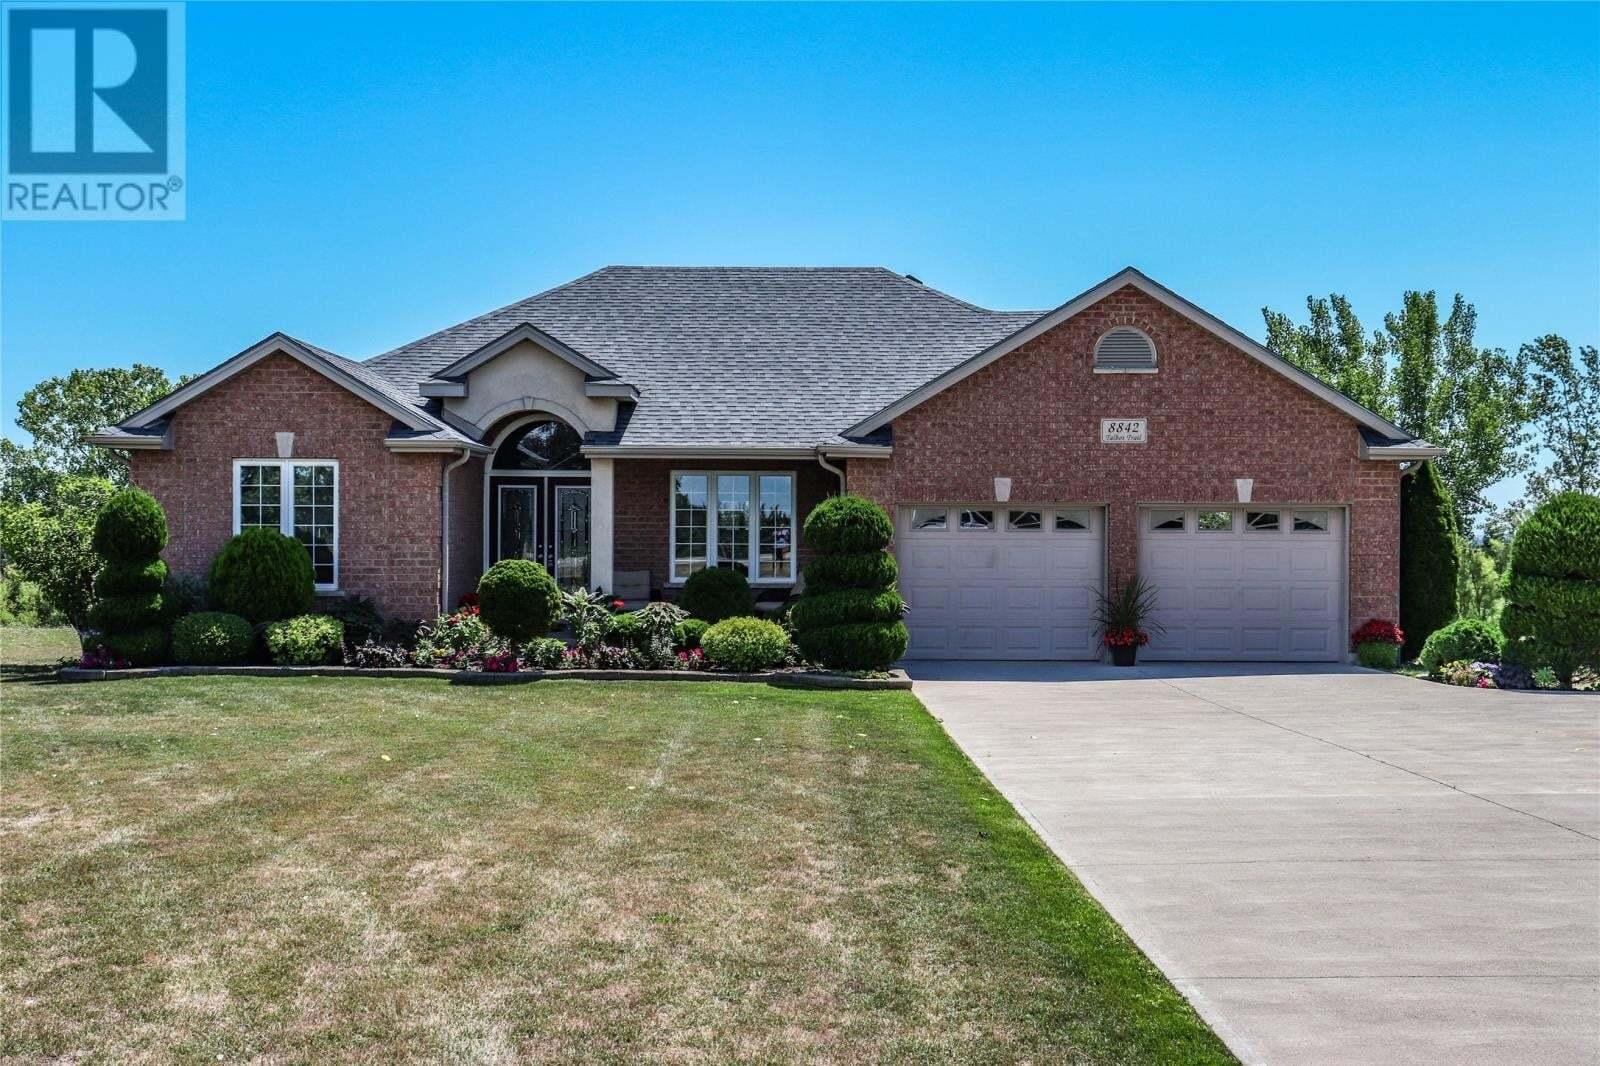 House for sale at 8842 Talbot Tr Blenheim Ontario - MLS: 20009294